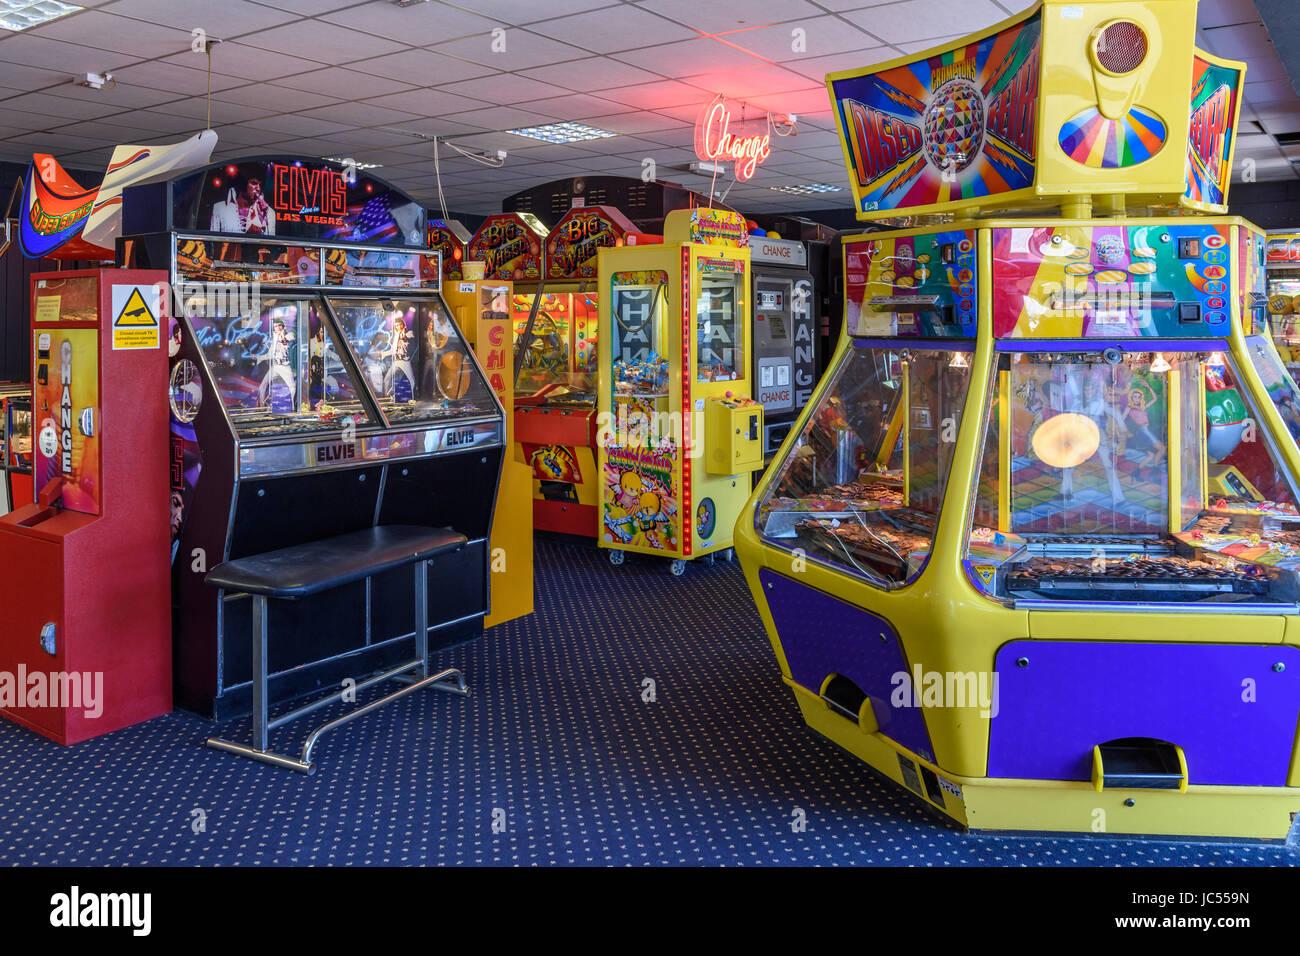 Arcade games, Needles Landmark Attraction, Isle of Wight, UK - Stock Image